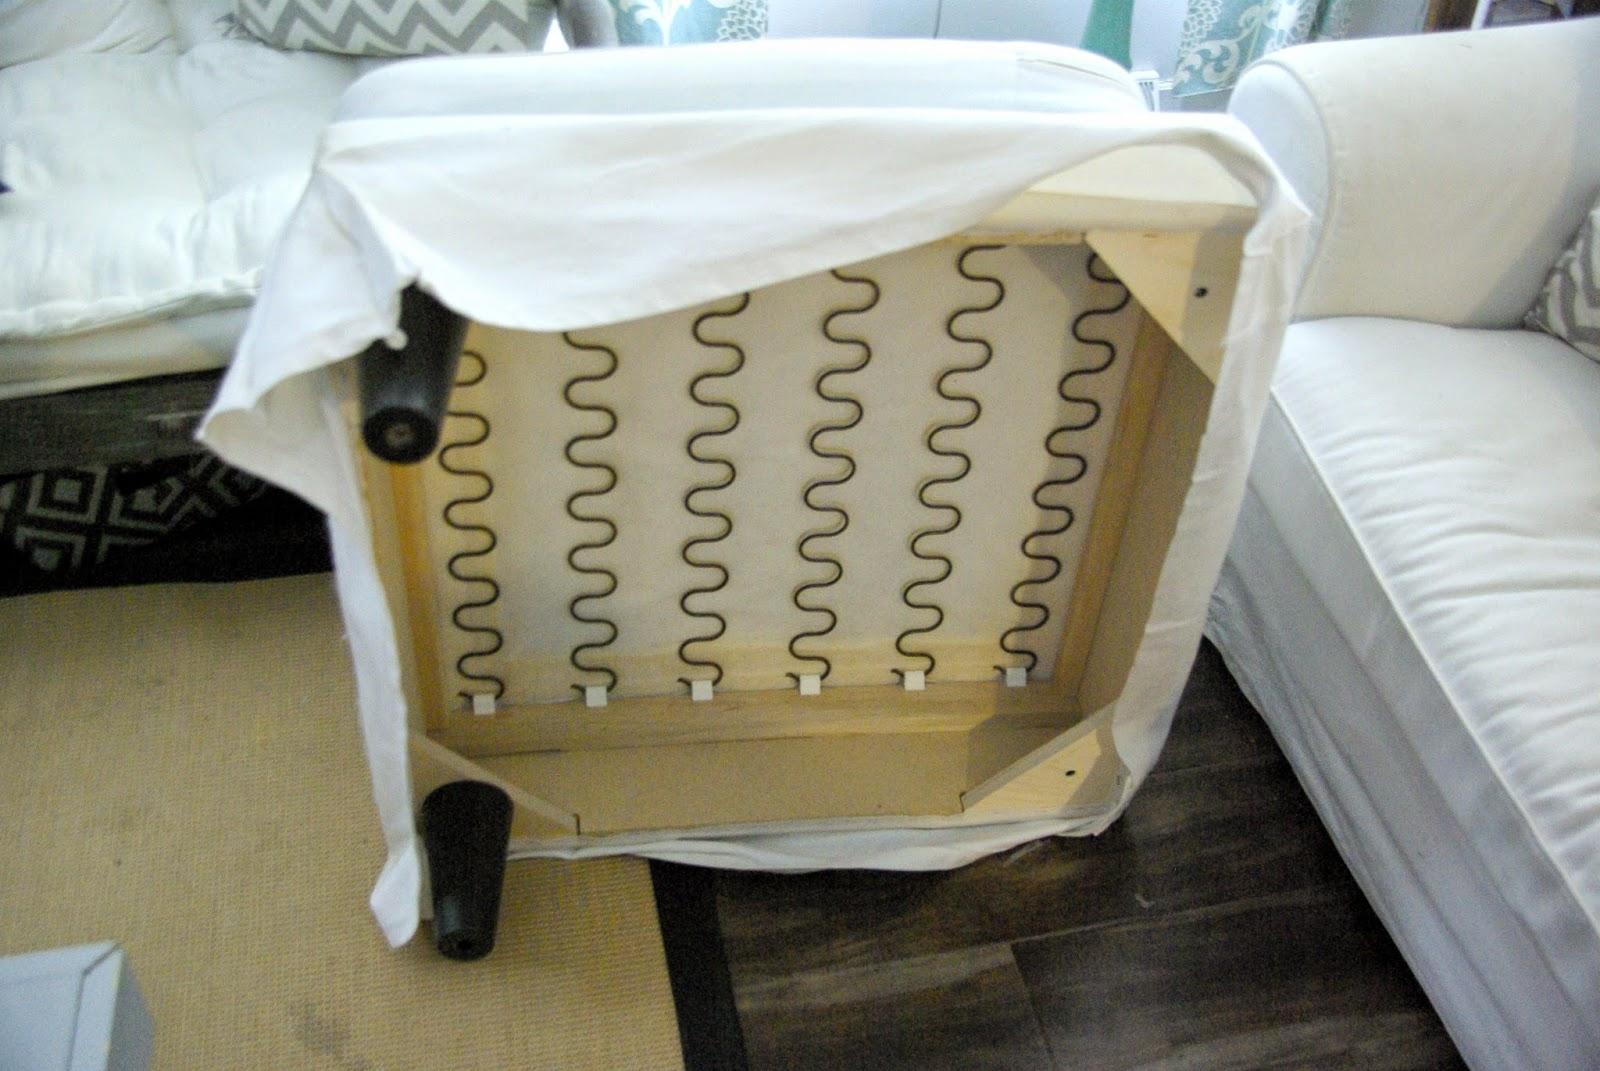 Our house now a home IKEA Ektorp sofa hack : ektorp2Bcouch from ourhousenowahome.com size 1600 x 1071 jpeg 267kB